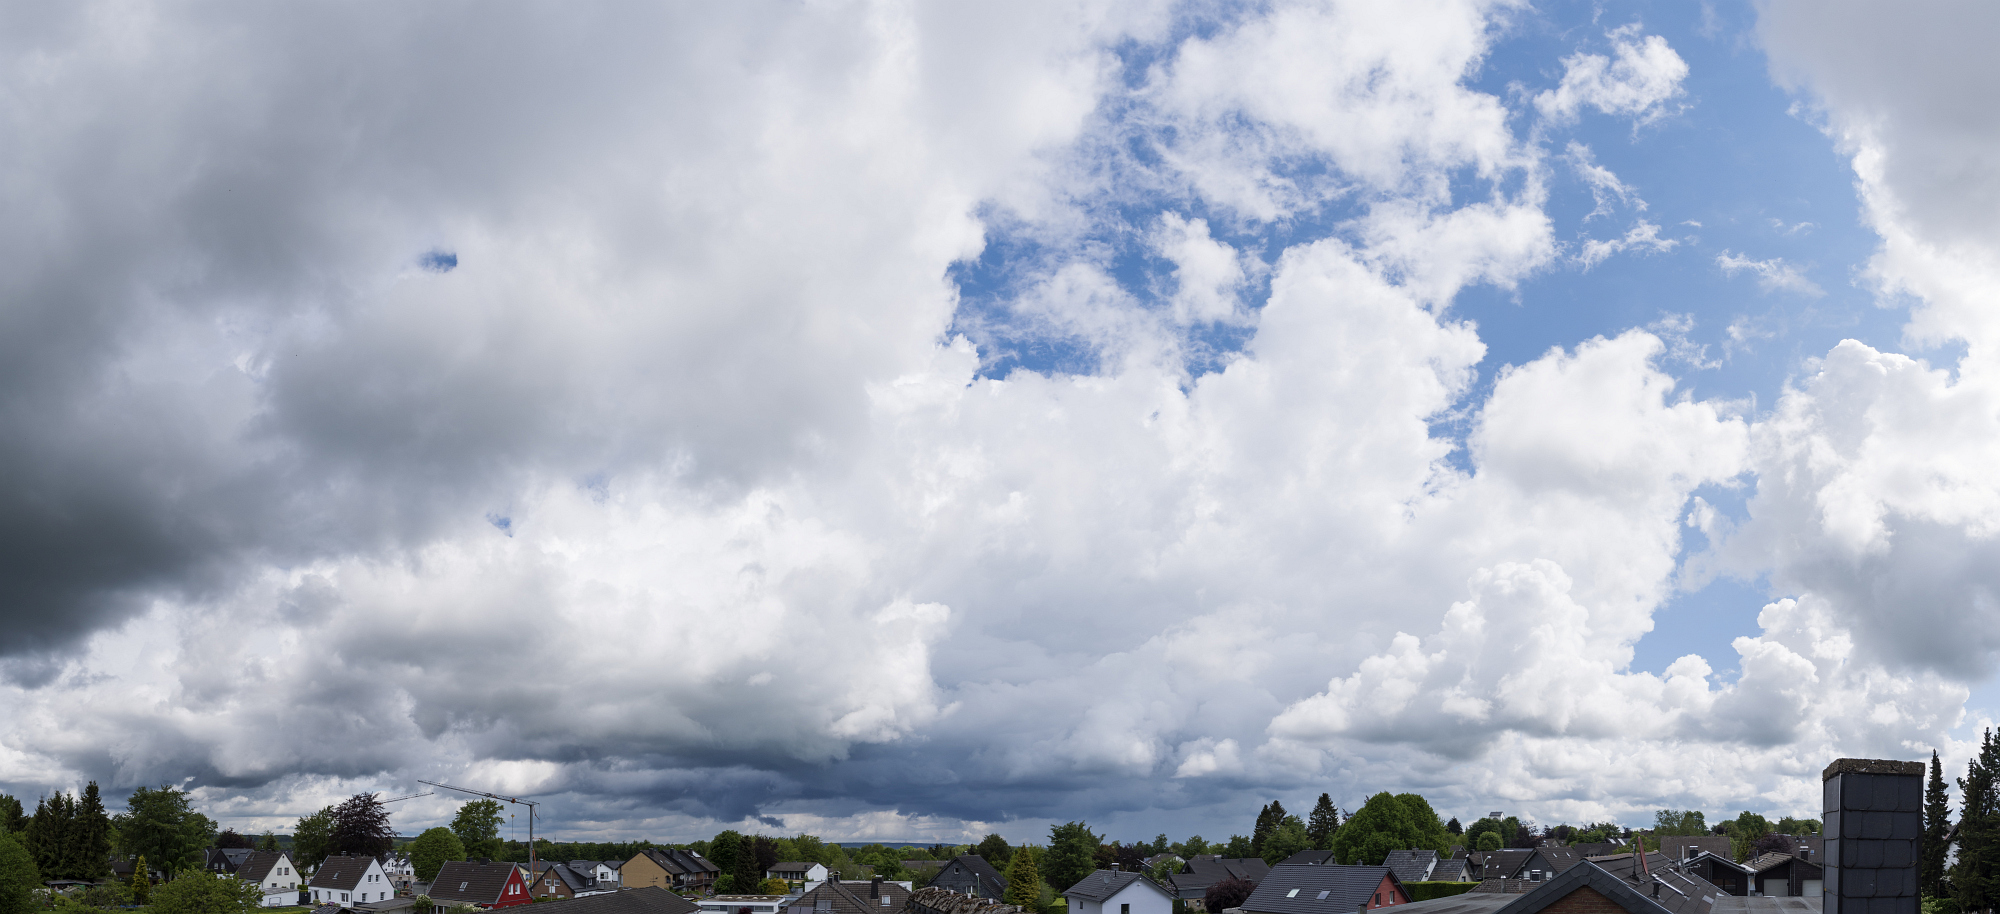 http://www.eifelmomente.de/albums/Nordeifel/Fruehjahr/2016_05_27_Tornado_Gewitter_Eifel_Boerde/2016_05_27_-_08_Simmerath_Schauer_DNG_Pano_bearb.jpg